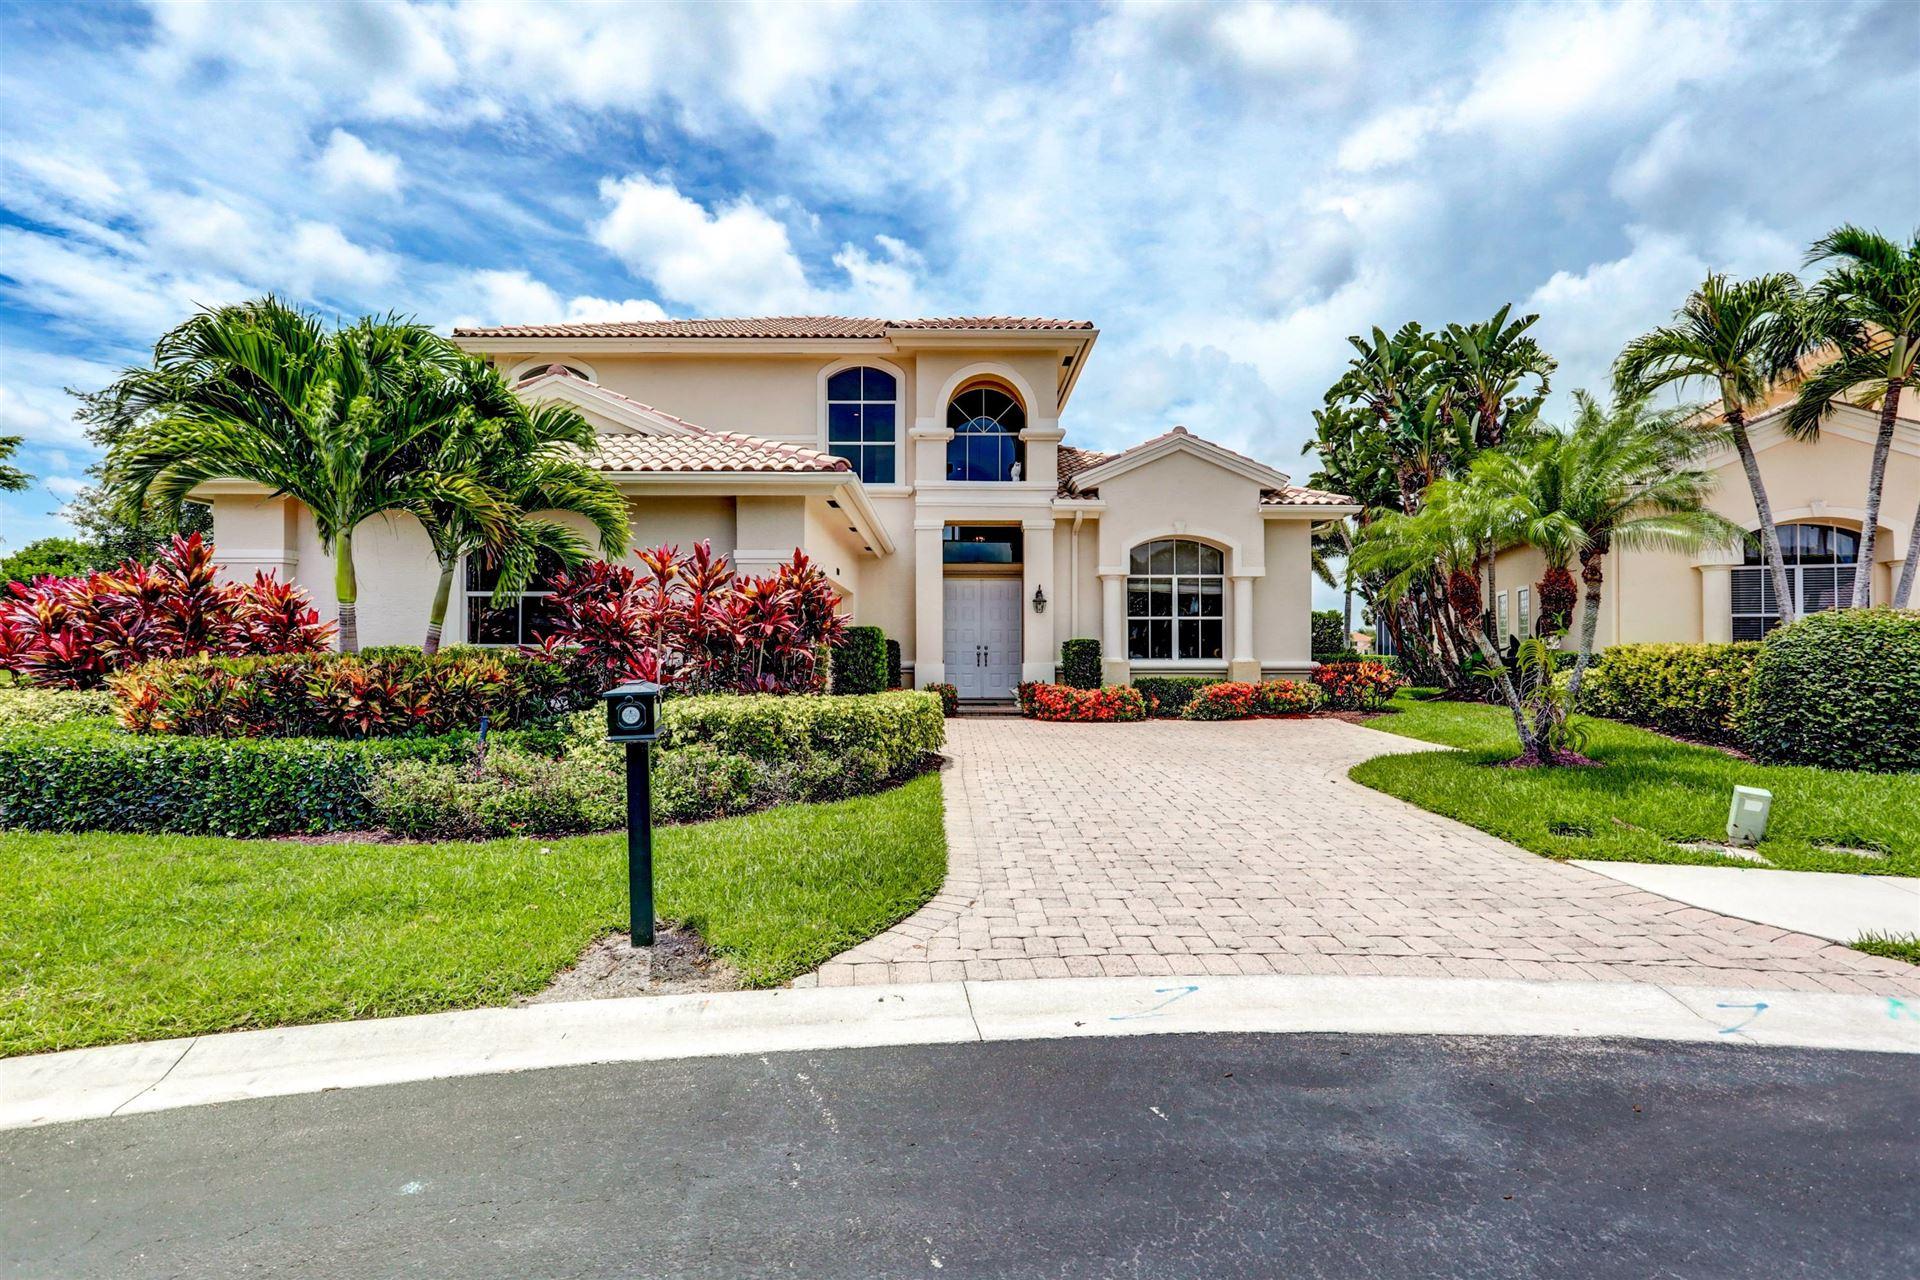 Photo of 1124 Grand Cay Drive, Palm Beach Gardens, FL 33418 (MLS # RX-10722991)